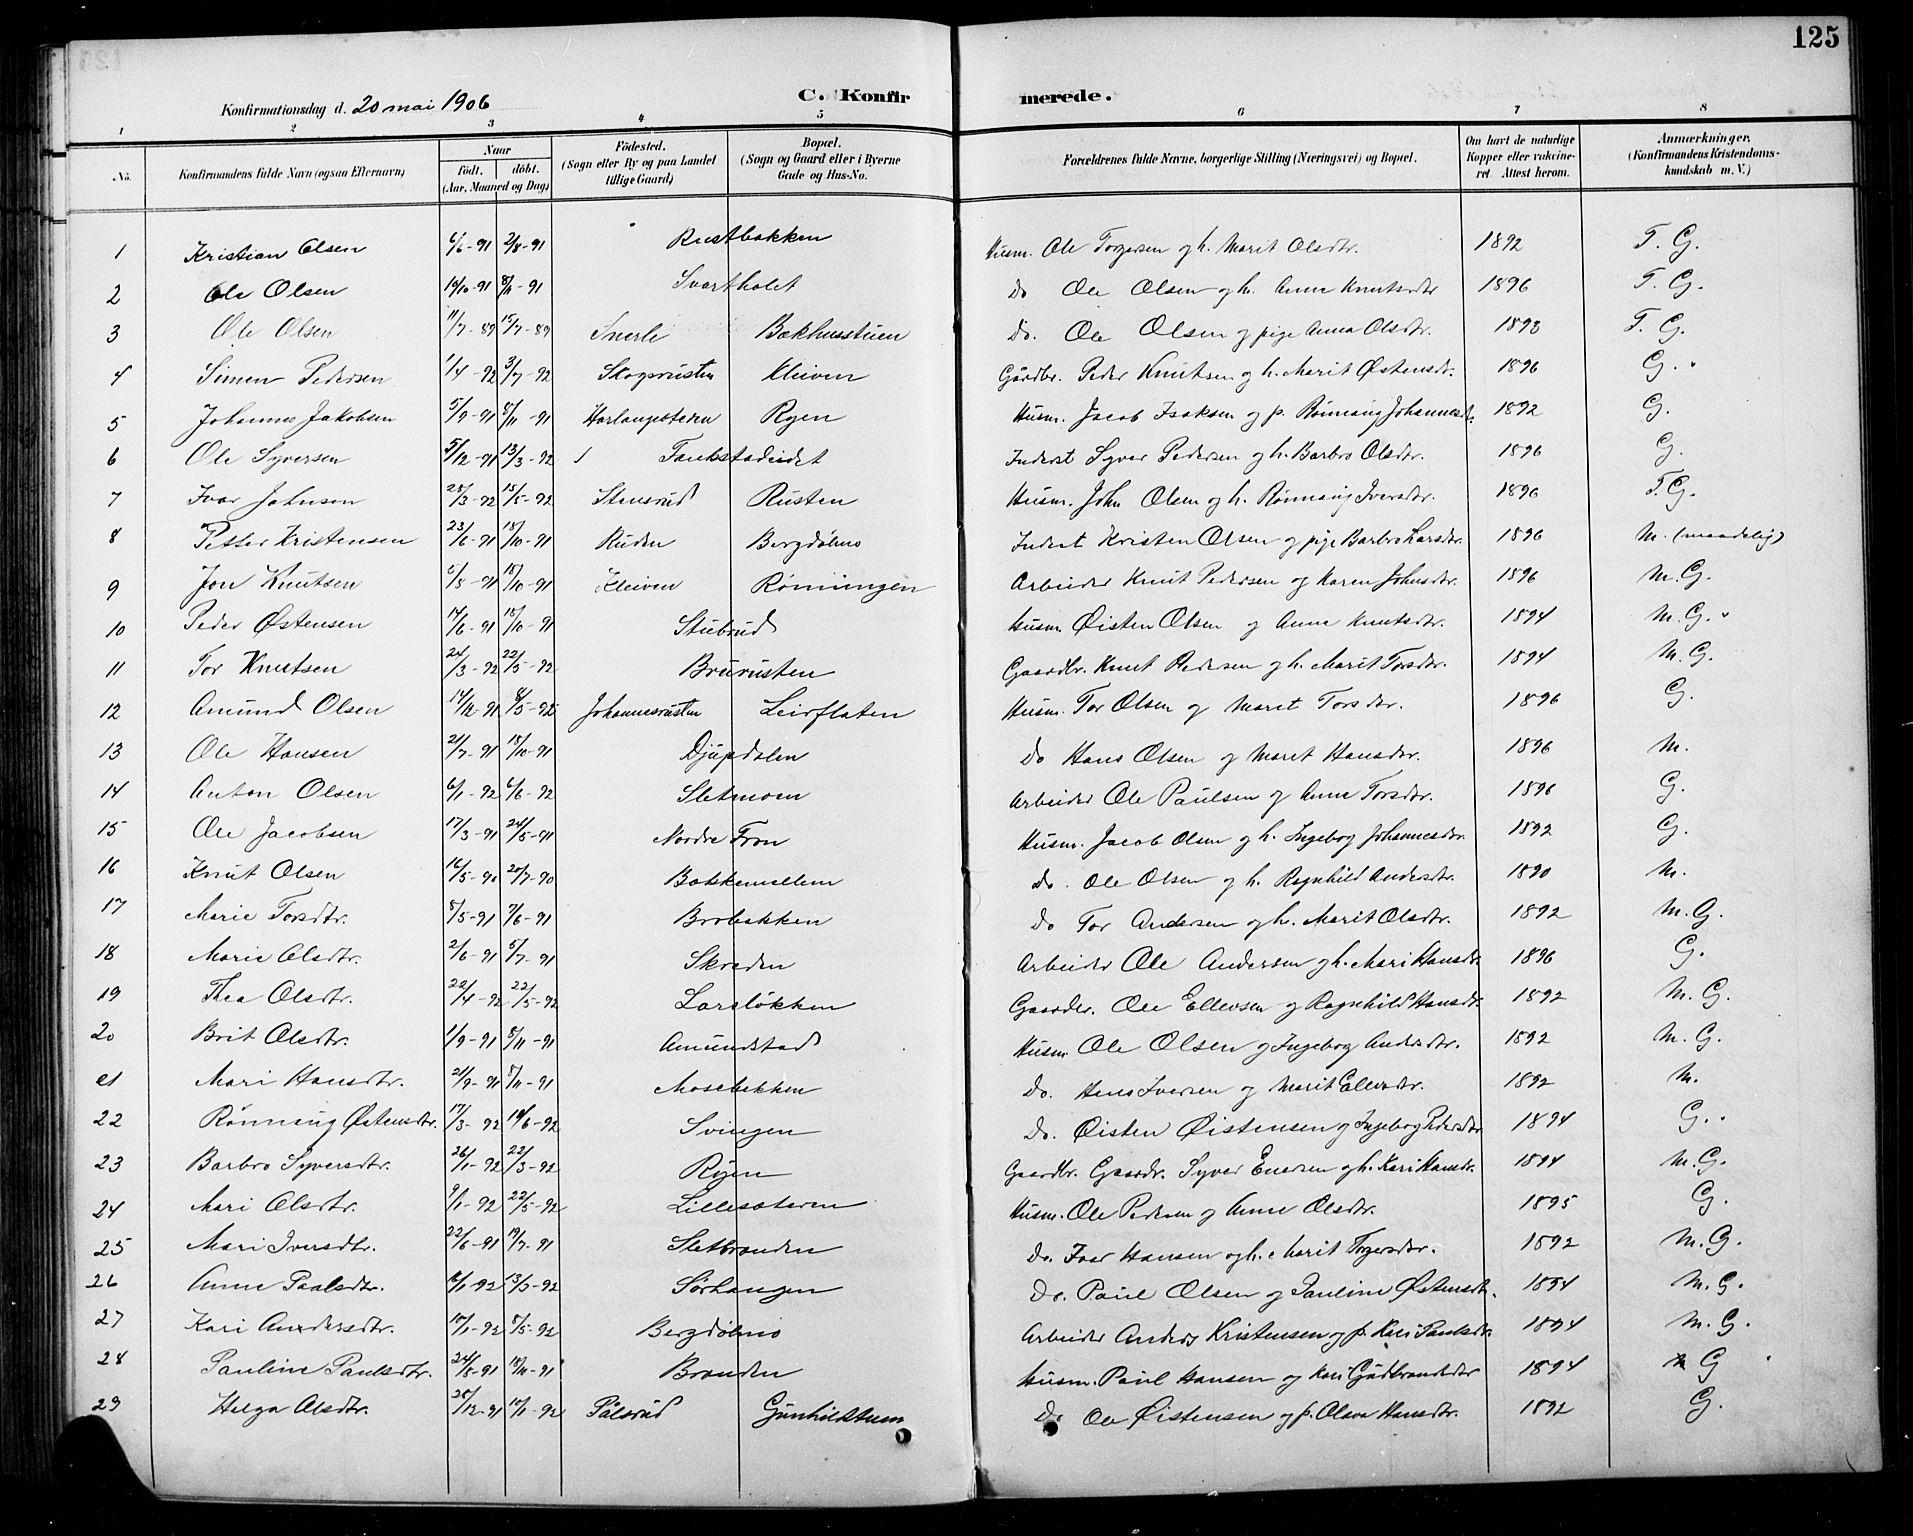 SAH, Sel prestekontor, Klokkerbok nr. 5, 1894-1923, s. 125